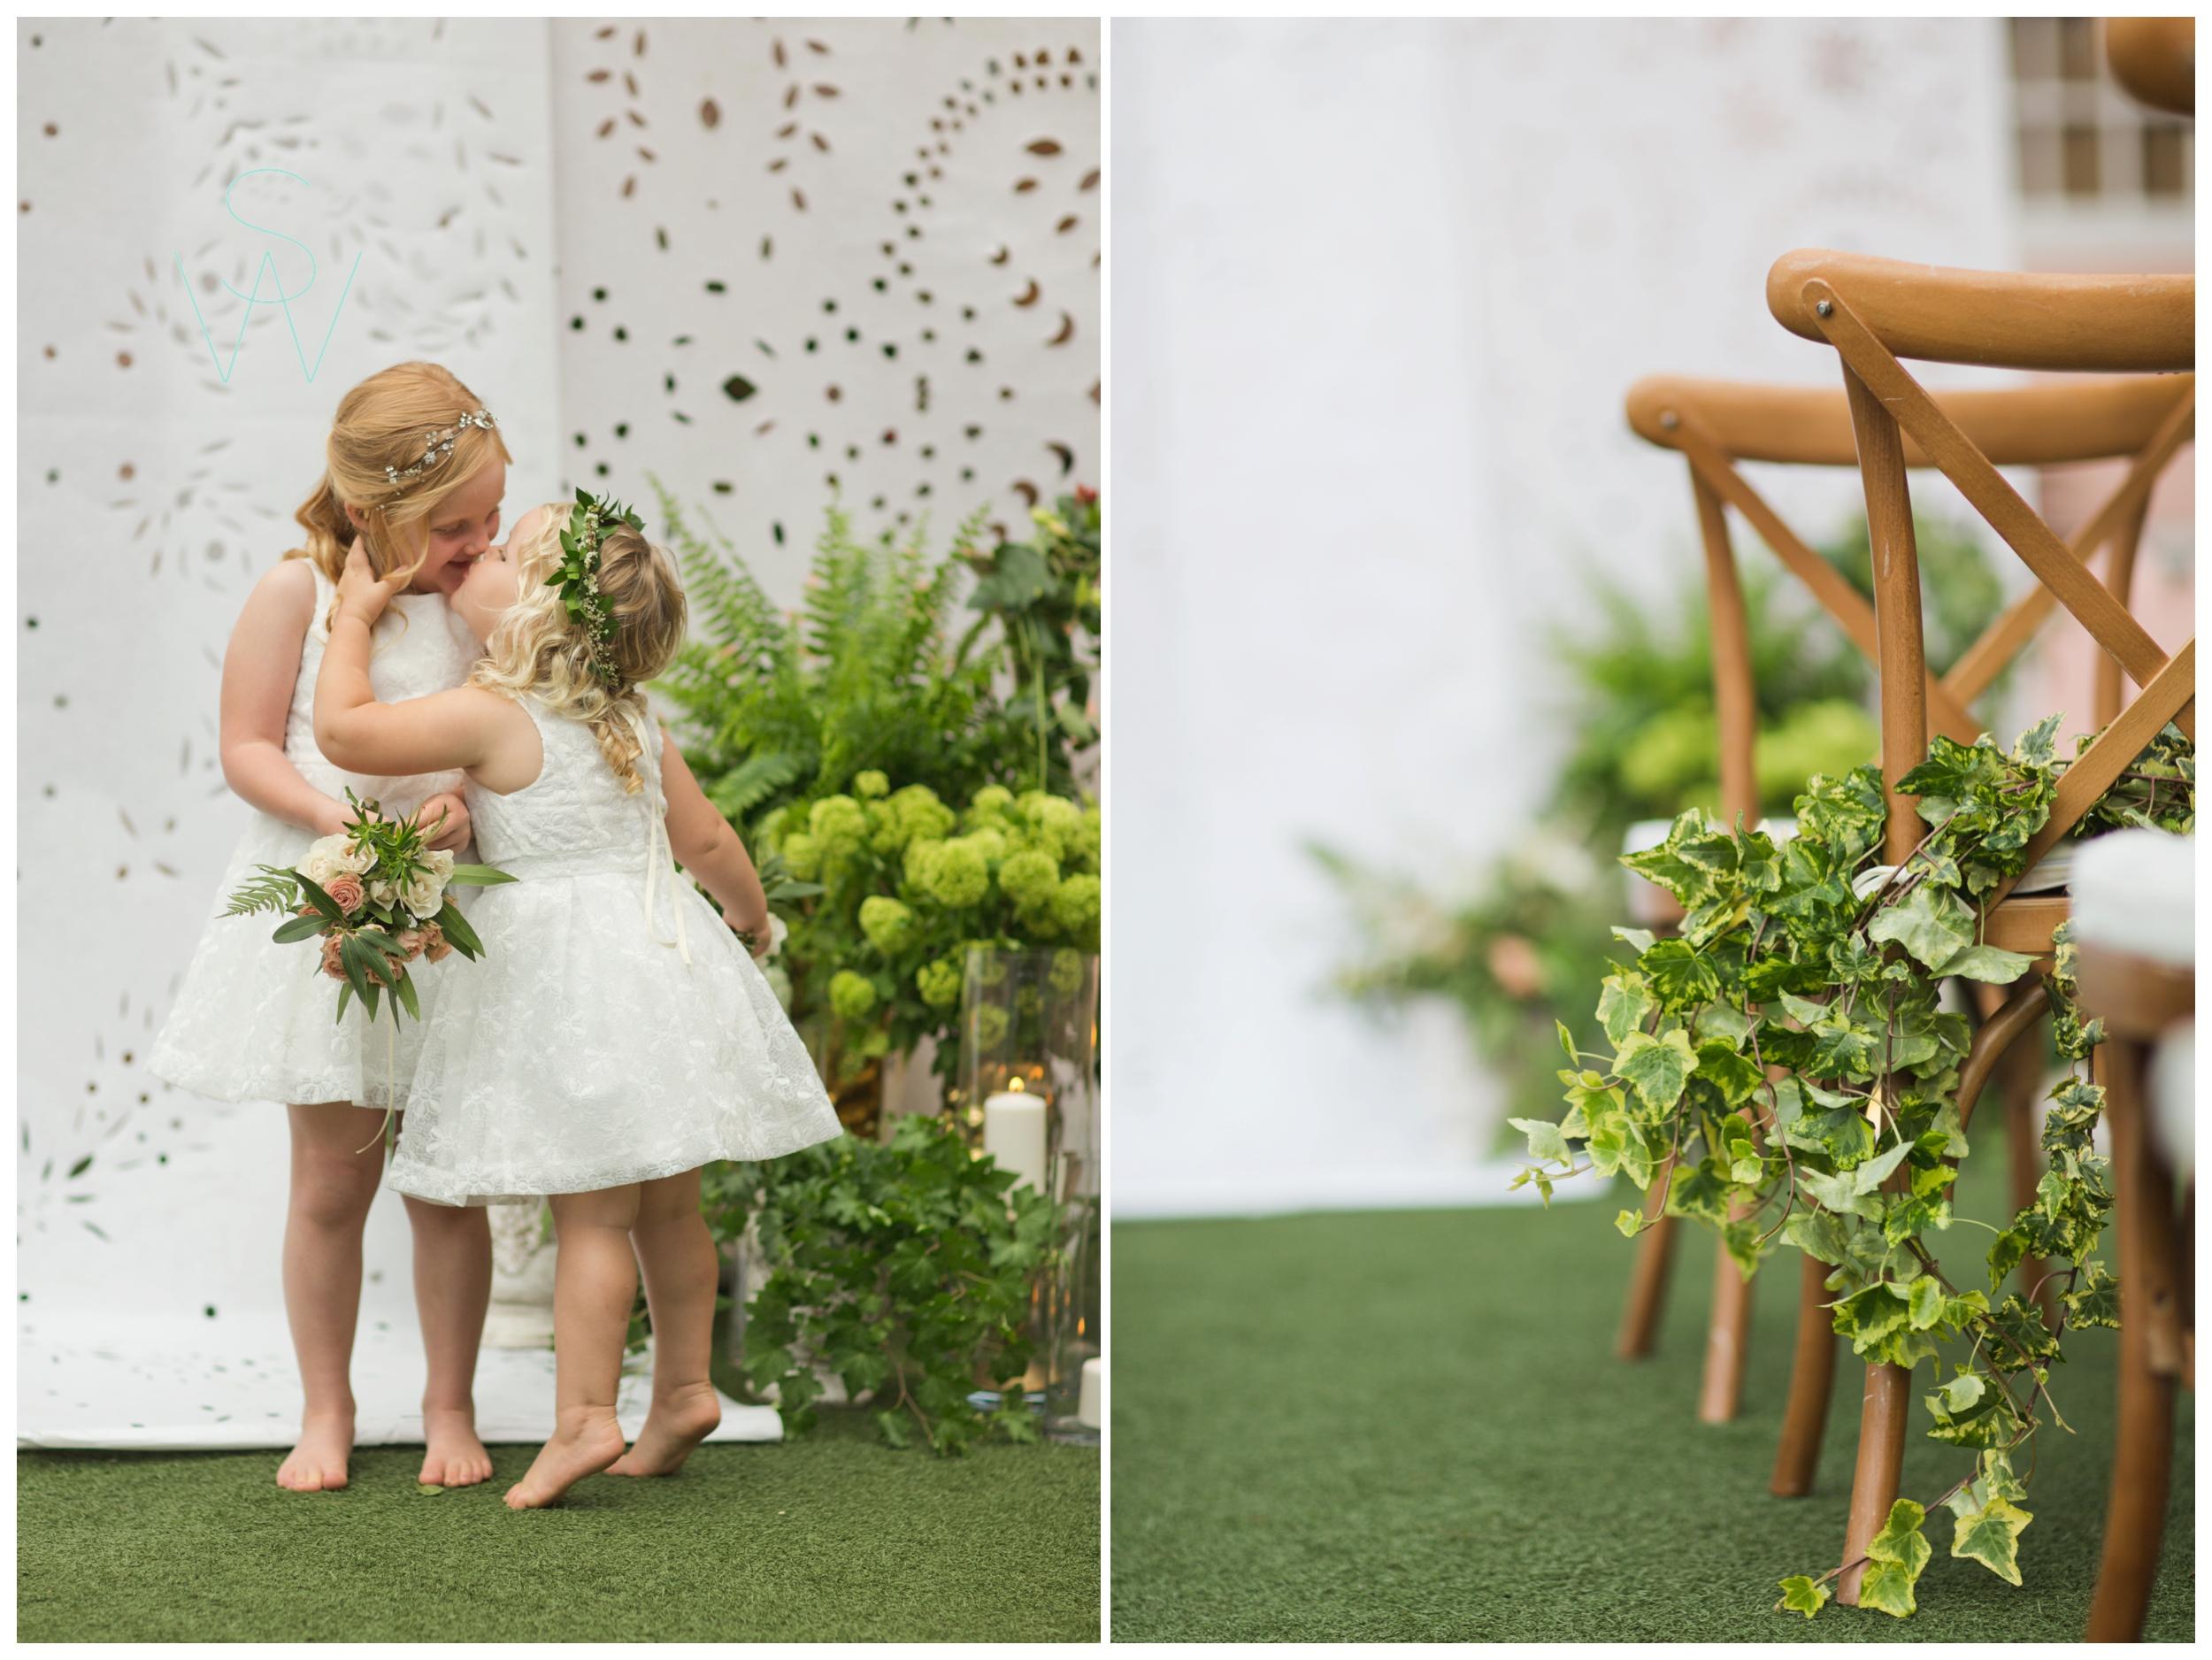 shewanders.wedding.photography.la.jolla153.jpg